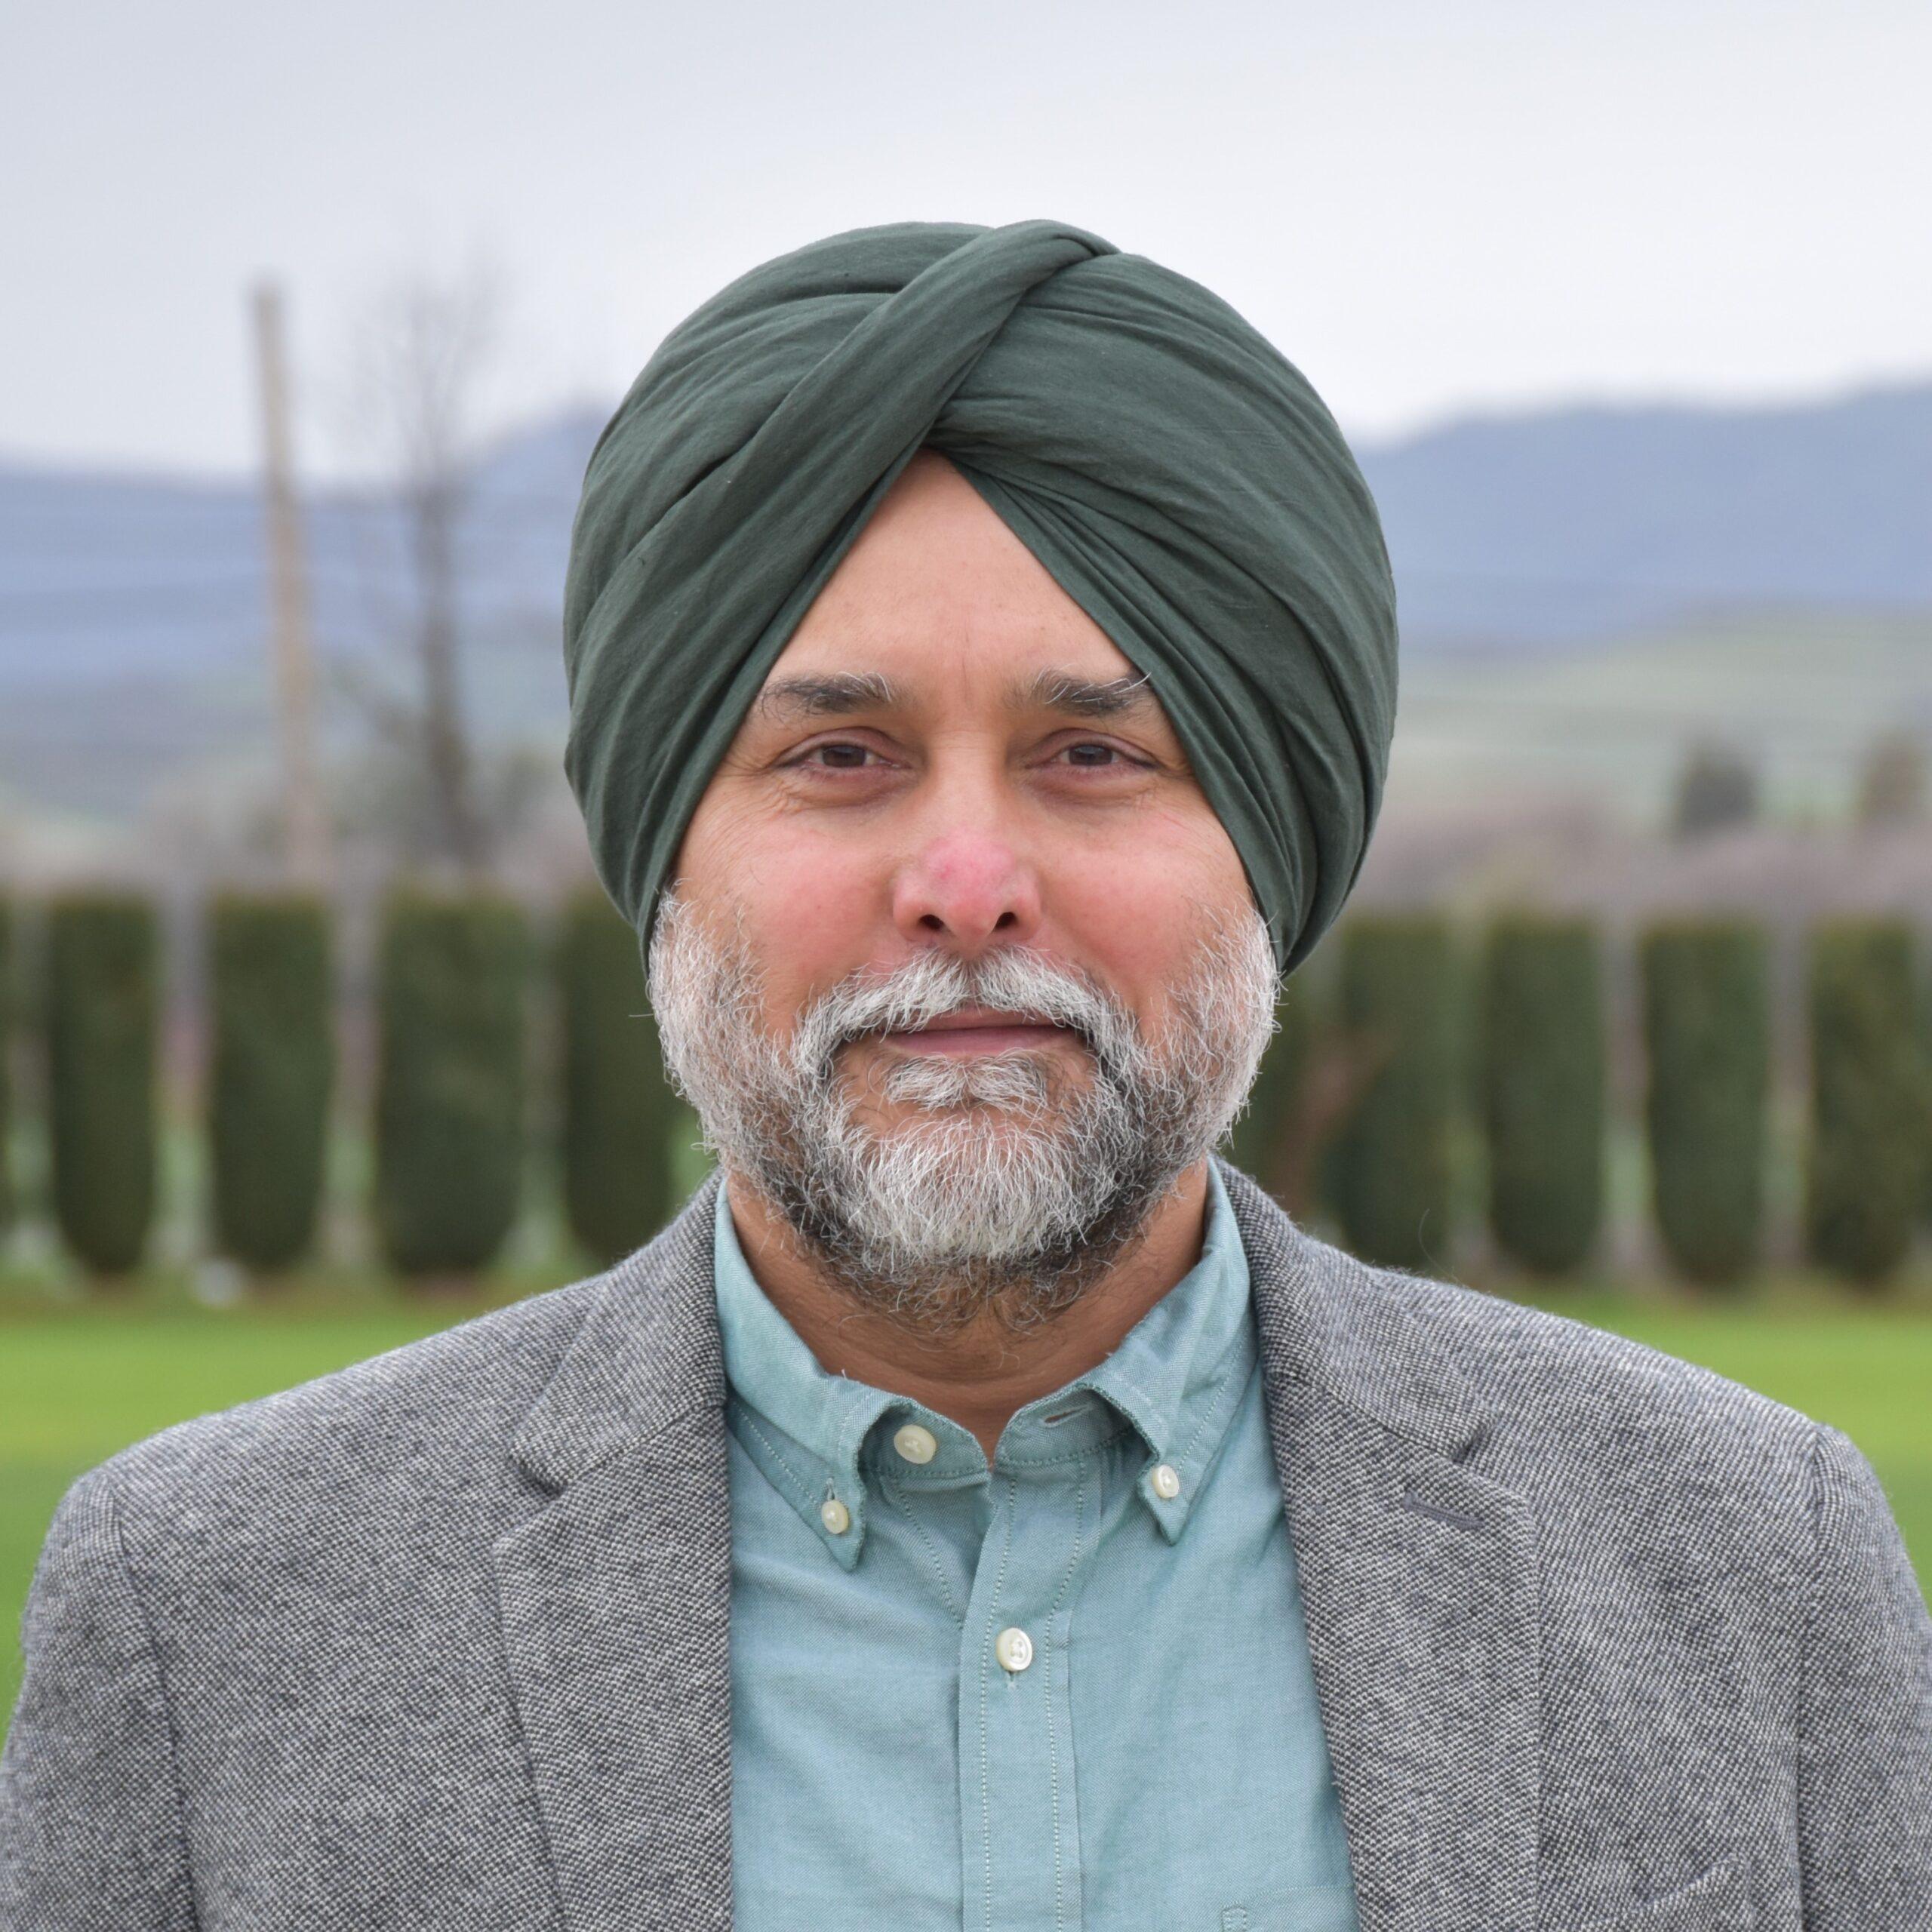 Amar Singh Matharu